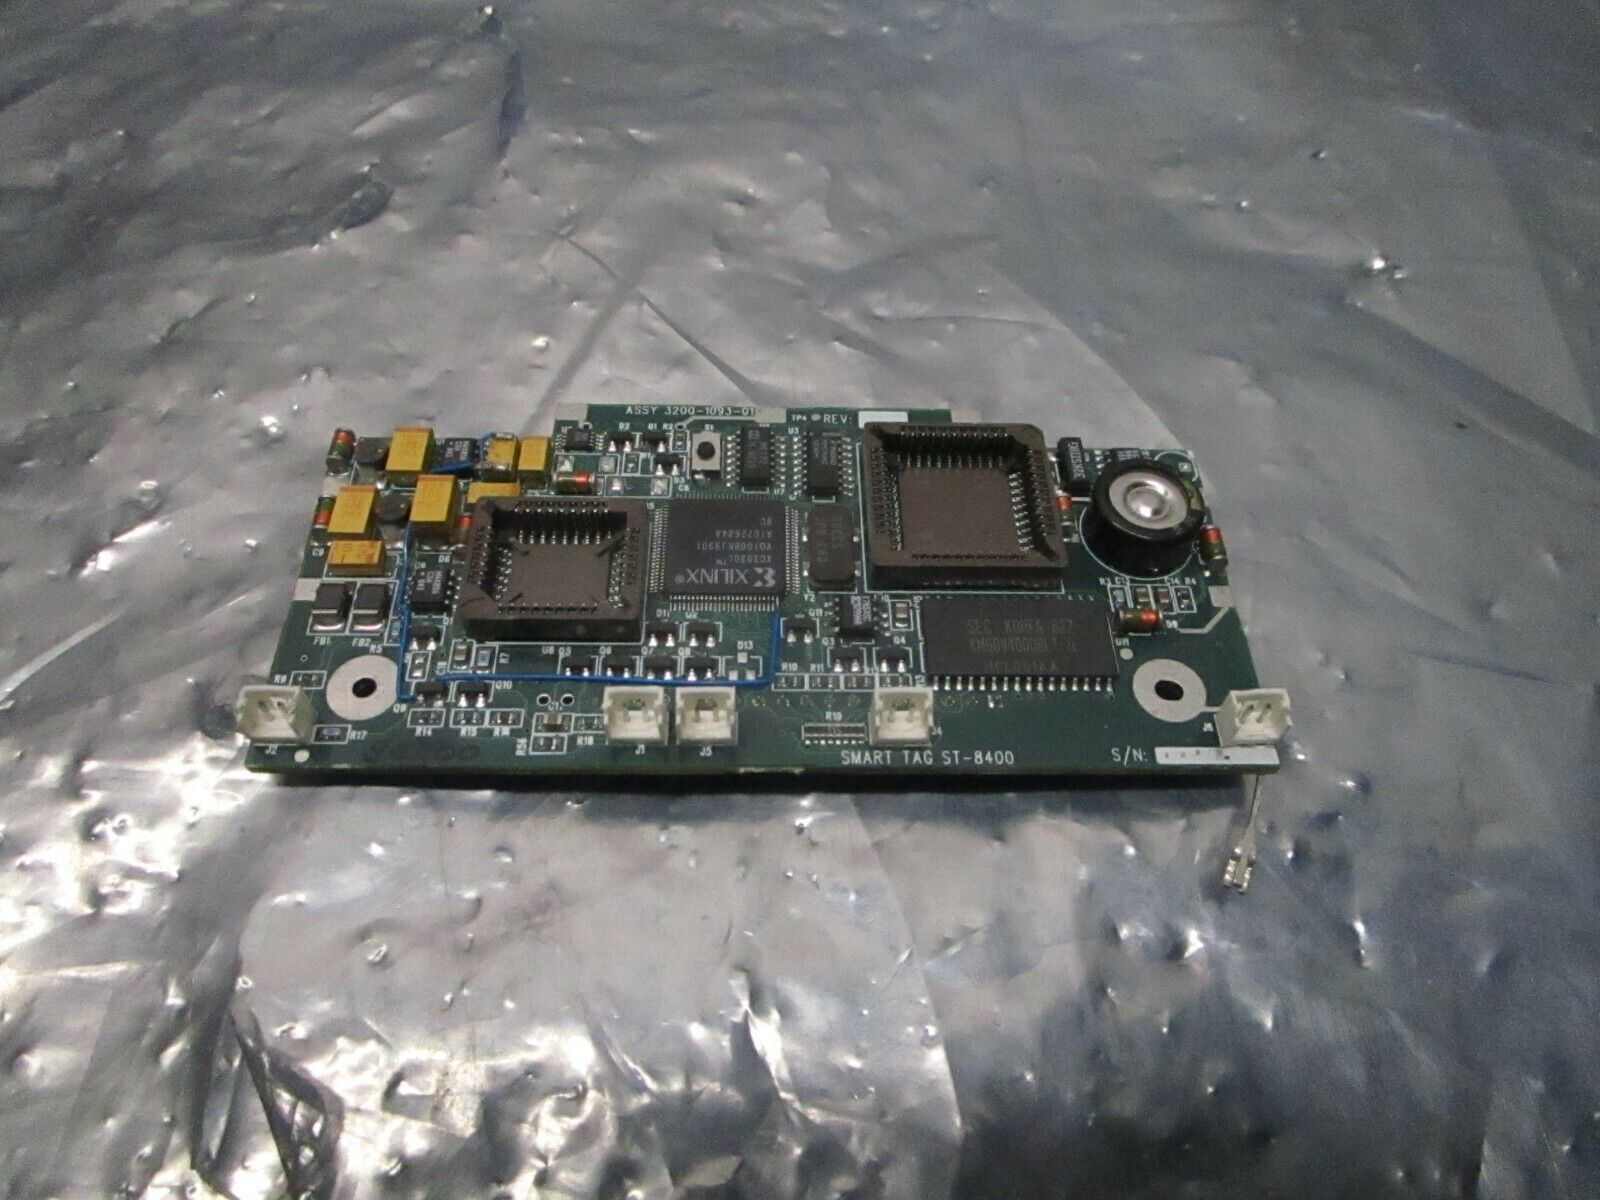 Asyst 3200-1093-01 Smart Tag ST-8400 Board, PCB, FAB 3000-1093-01, 101214